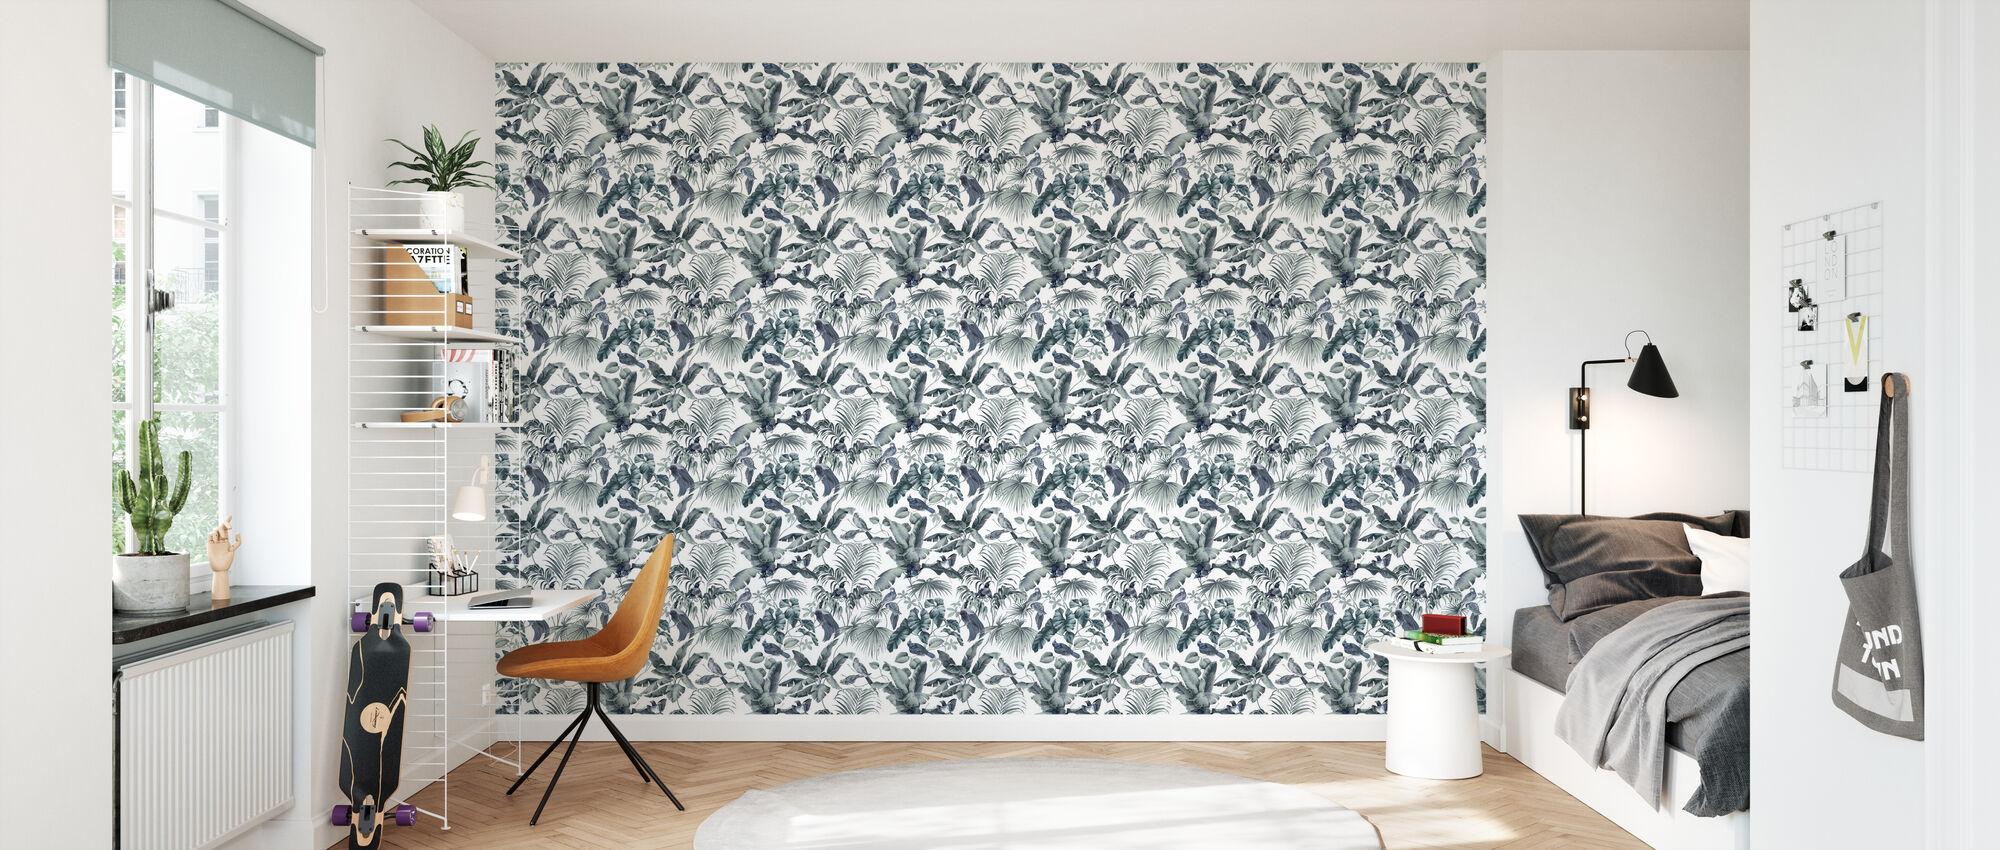 Jungle Canopy 2 Steel Gray - Wallpaper - Kids Room